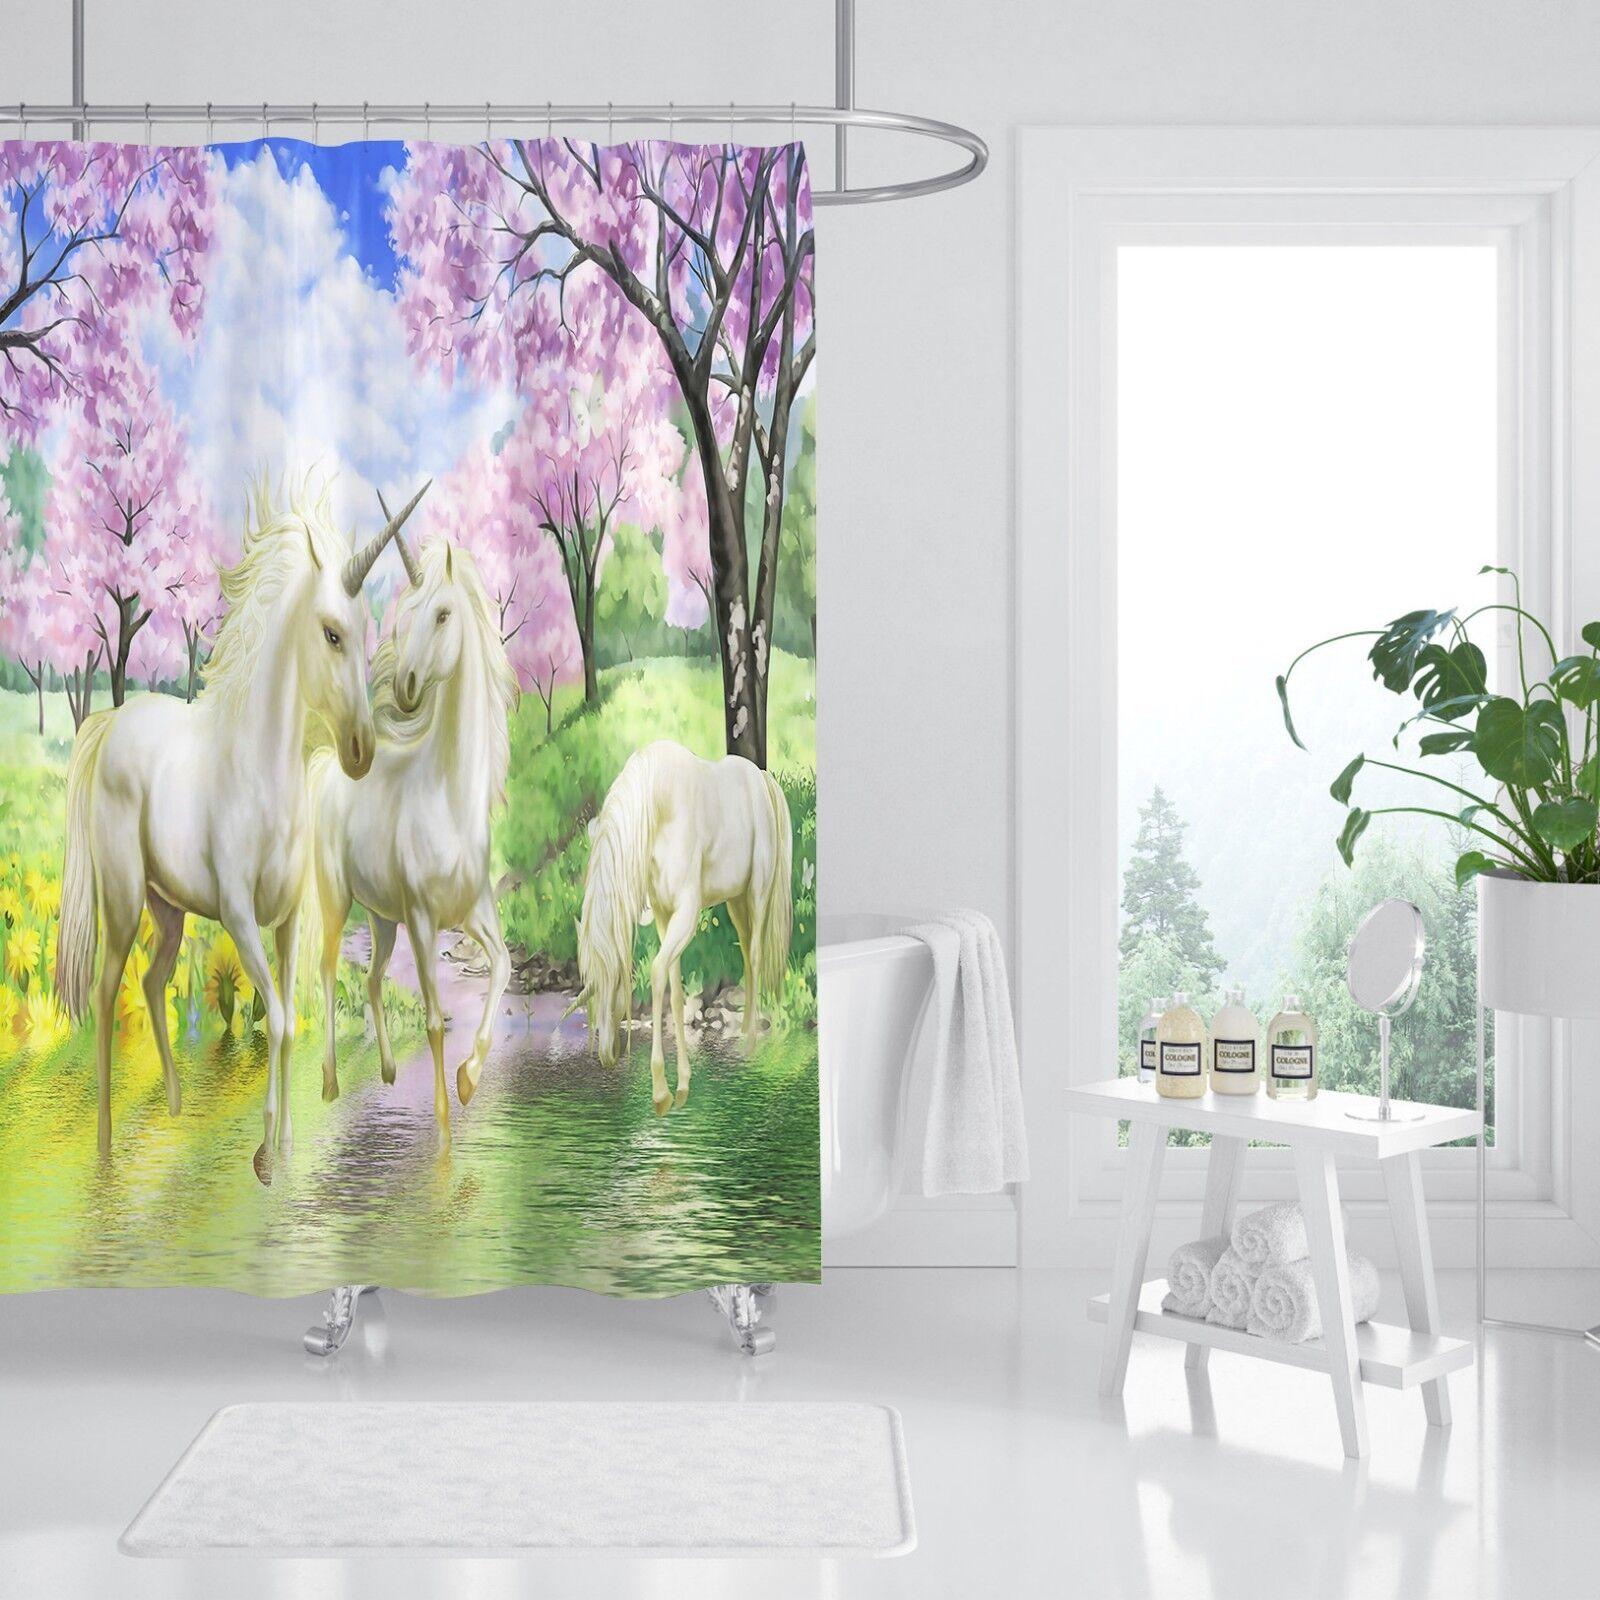 3D Einhorn 539  Duschvorhang Wasserdicht Faser Bad Daheim Windows Windows Windows Toilette DE 3061fa